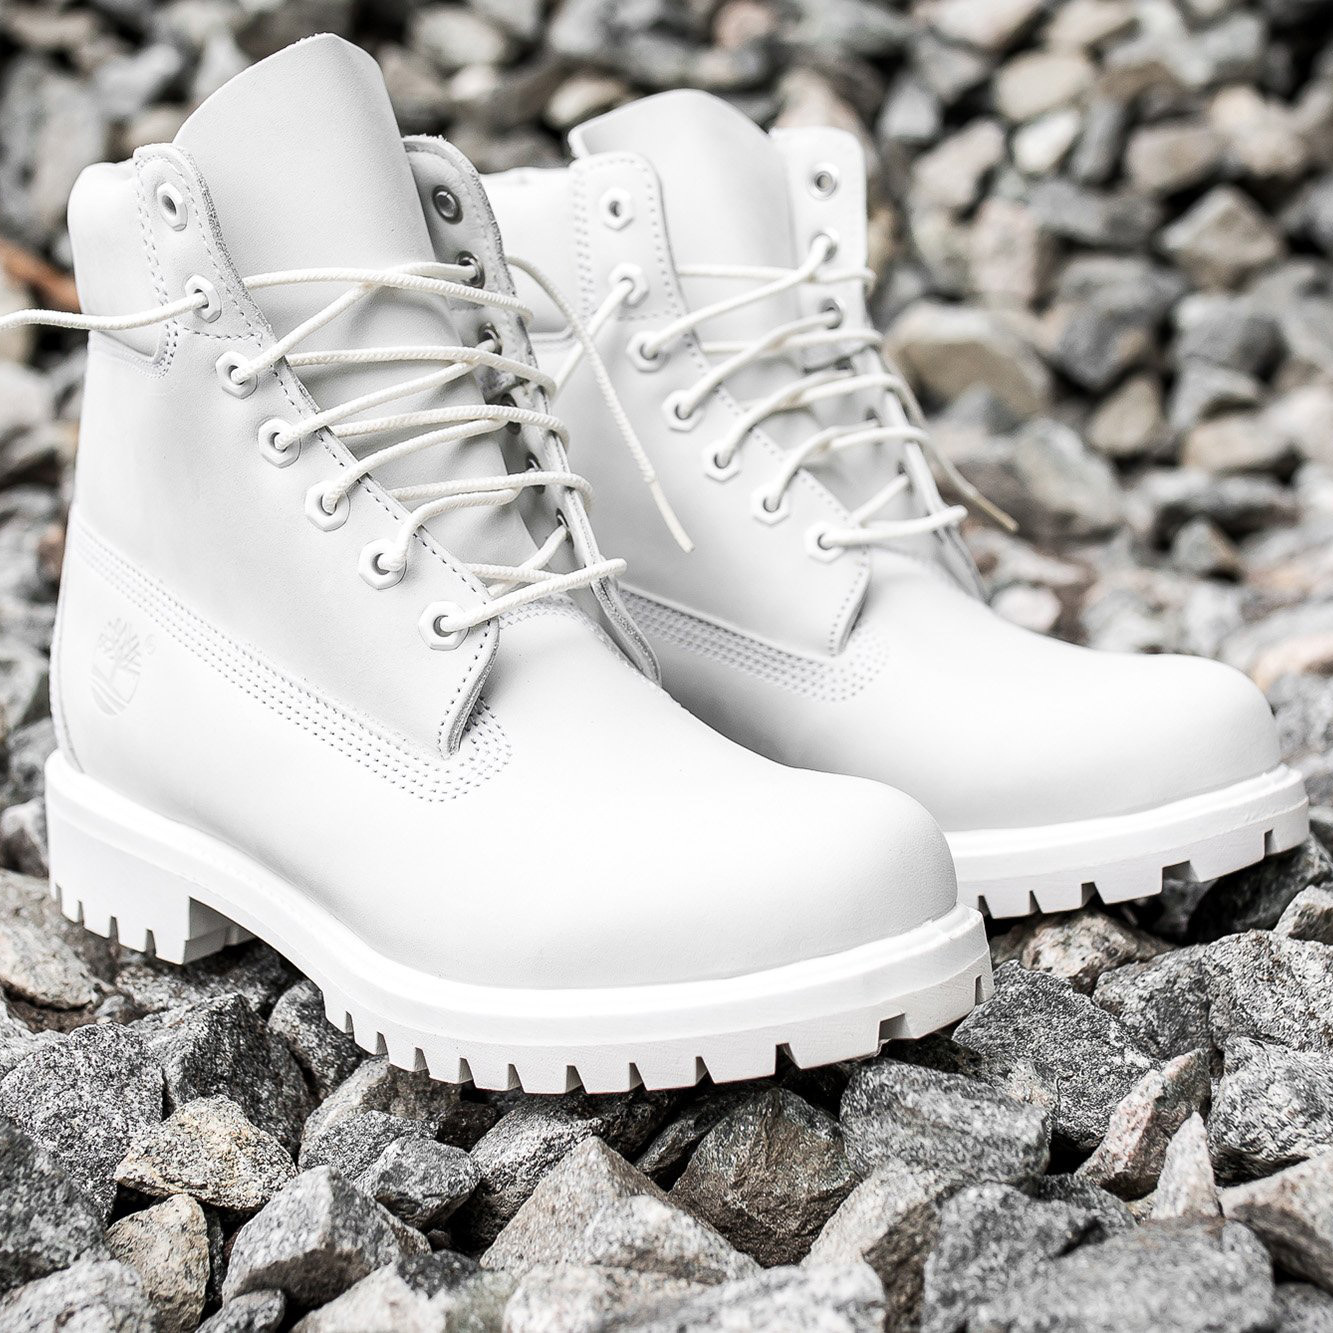 Timberland 6 Inch Premium Waterproof Boot and 50 similar items